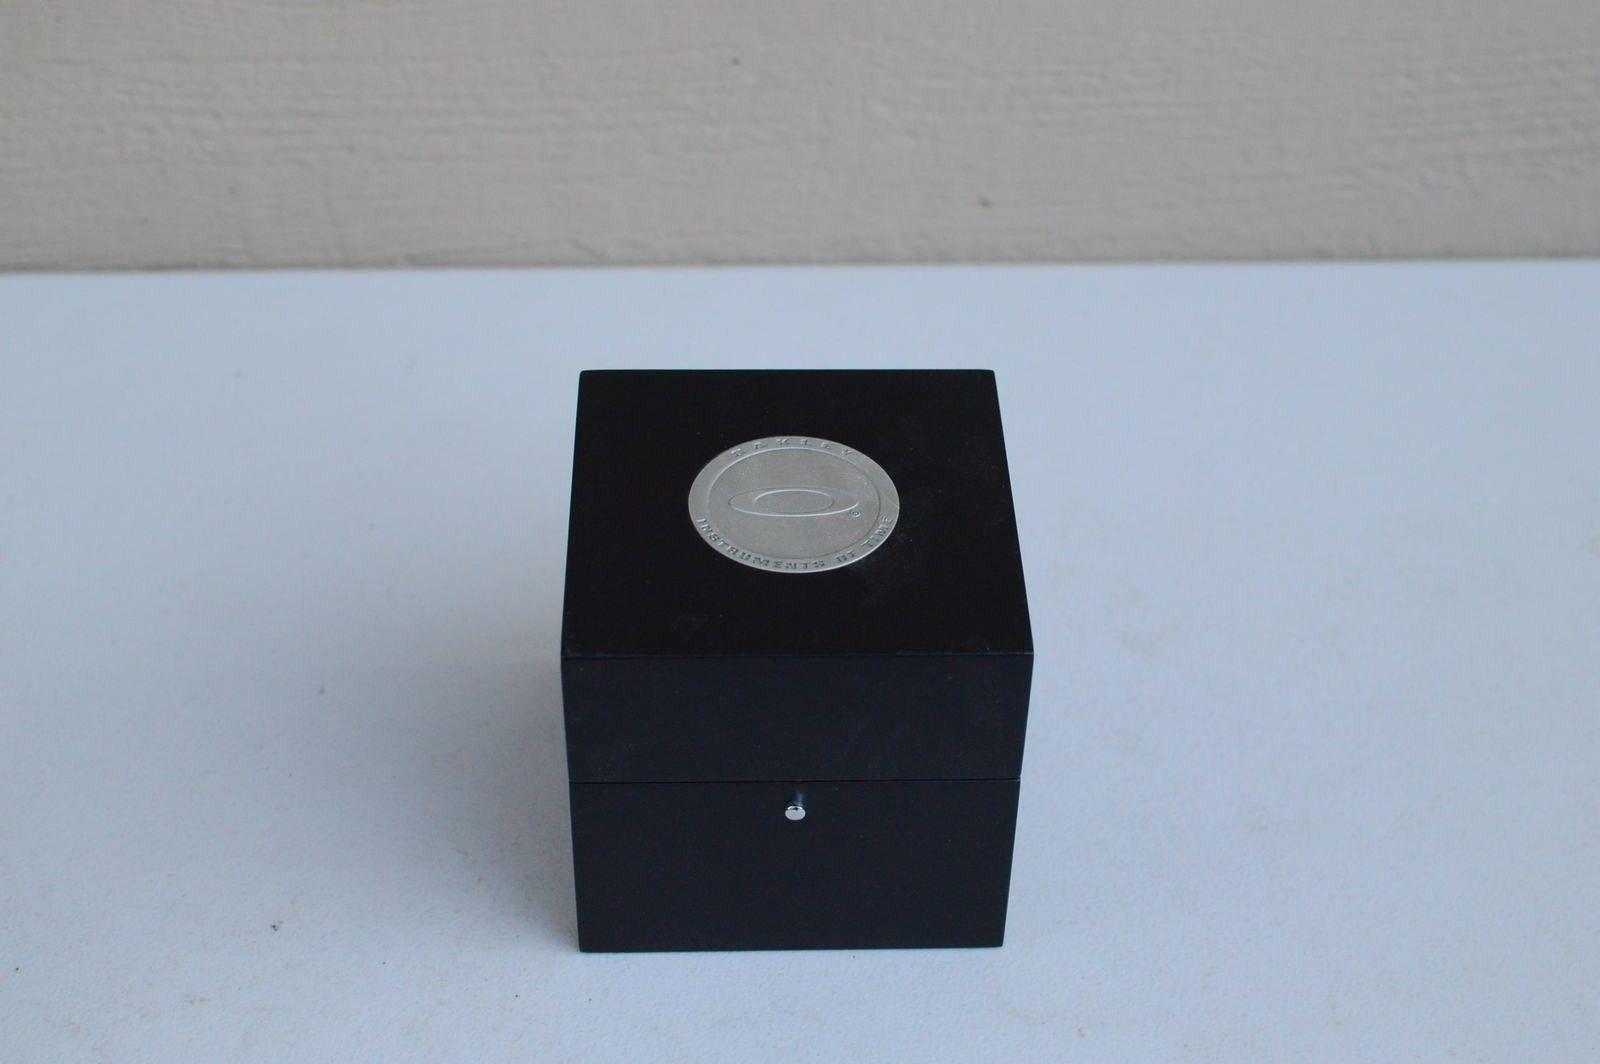 Gently Used Titanium Black Dial Minute Machine 10-193 - DSC_0170.JPG